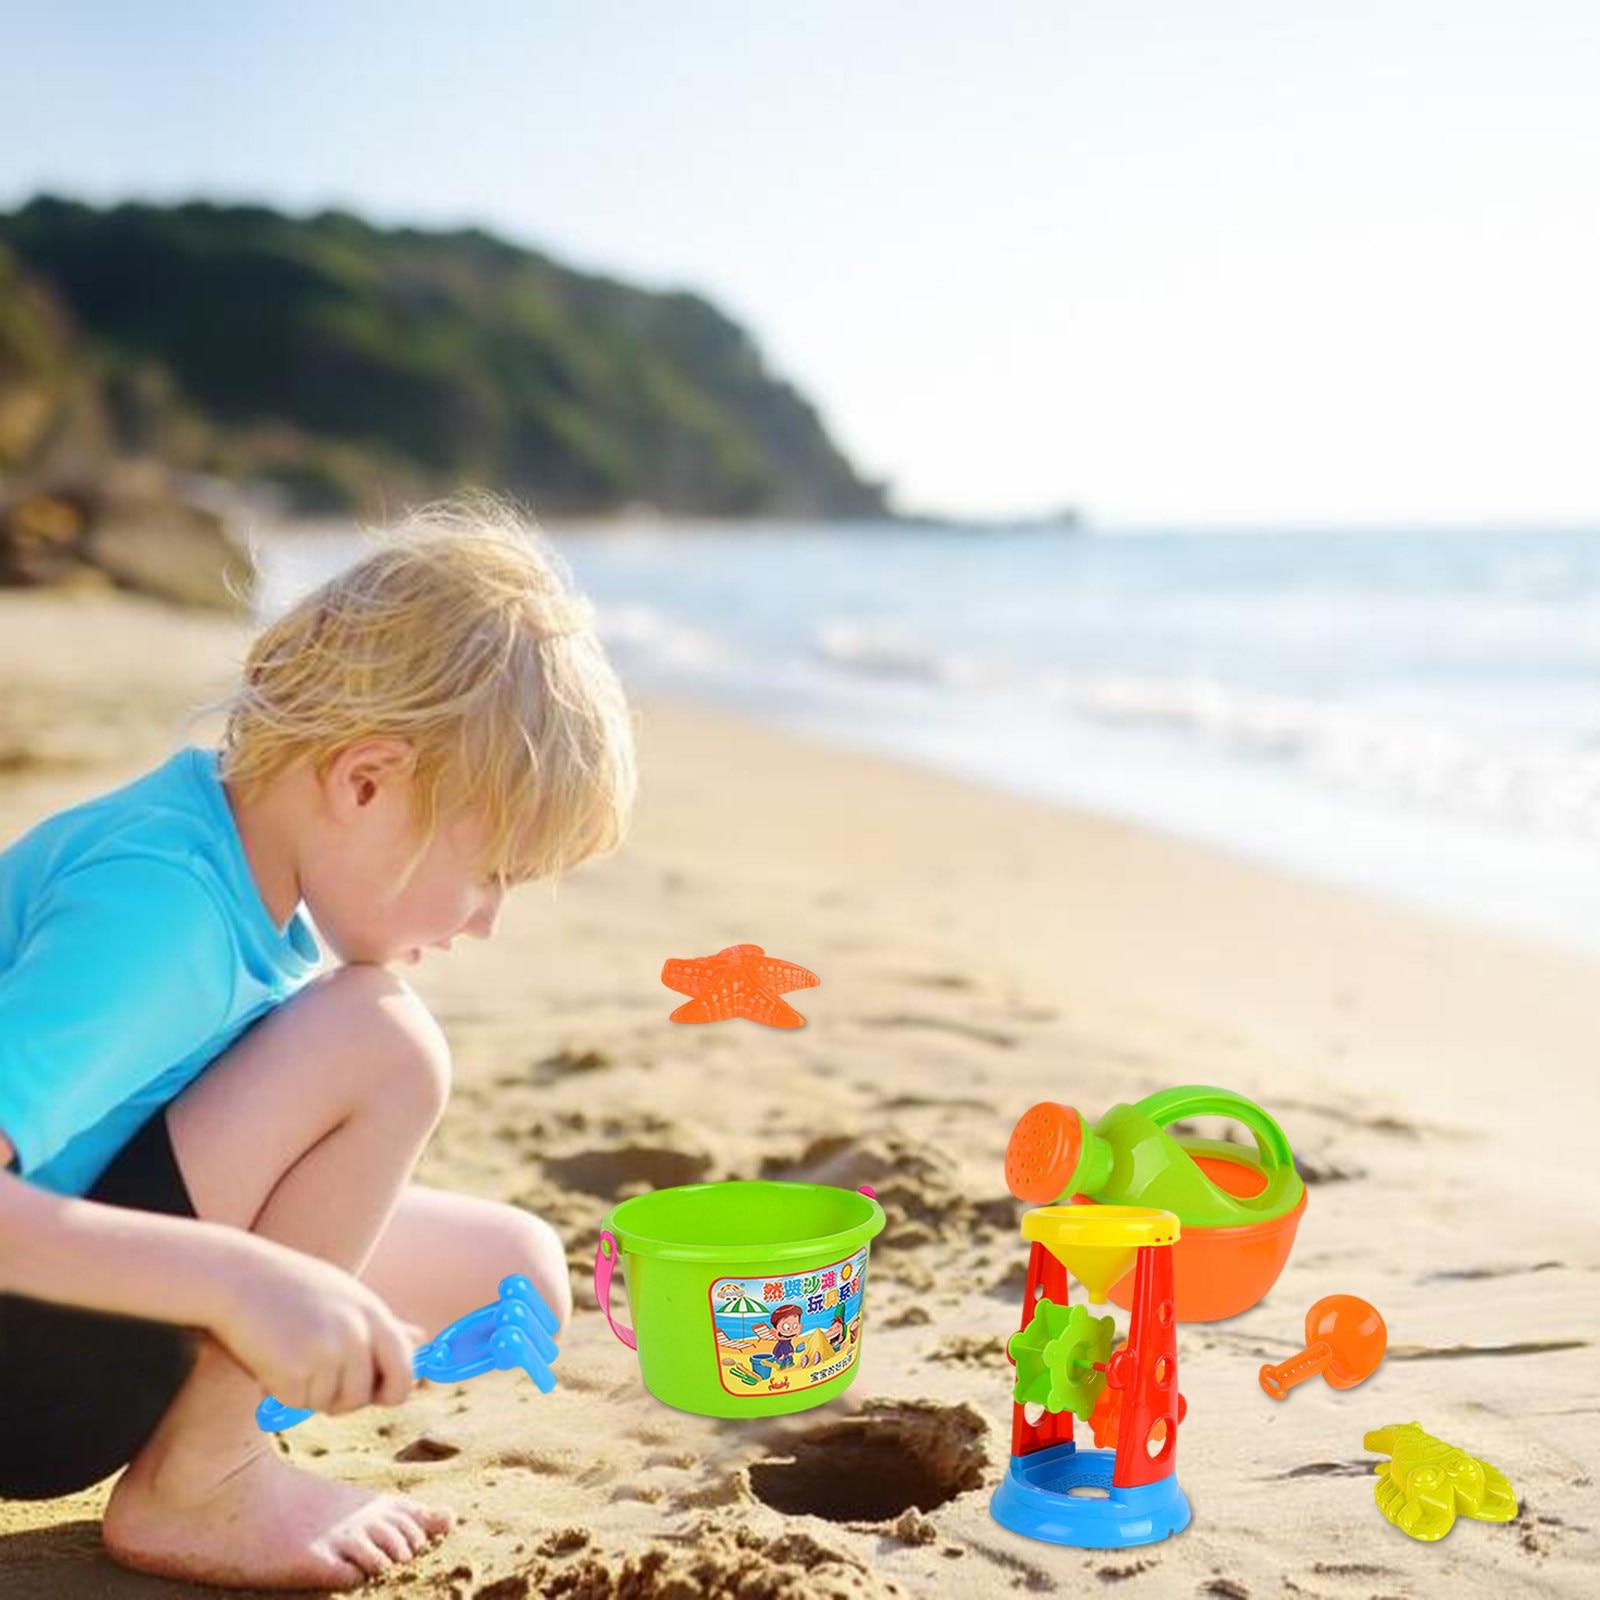 Beach Children's Toy Castle Bucket Shovel Spade Tool Toy And Sandbeach Kids Beach Toys Kids Children Beach Sand Dune Toys